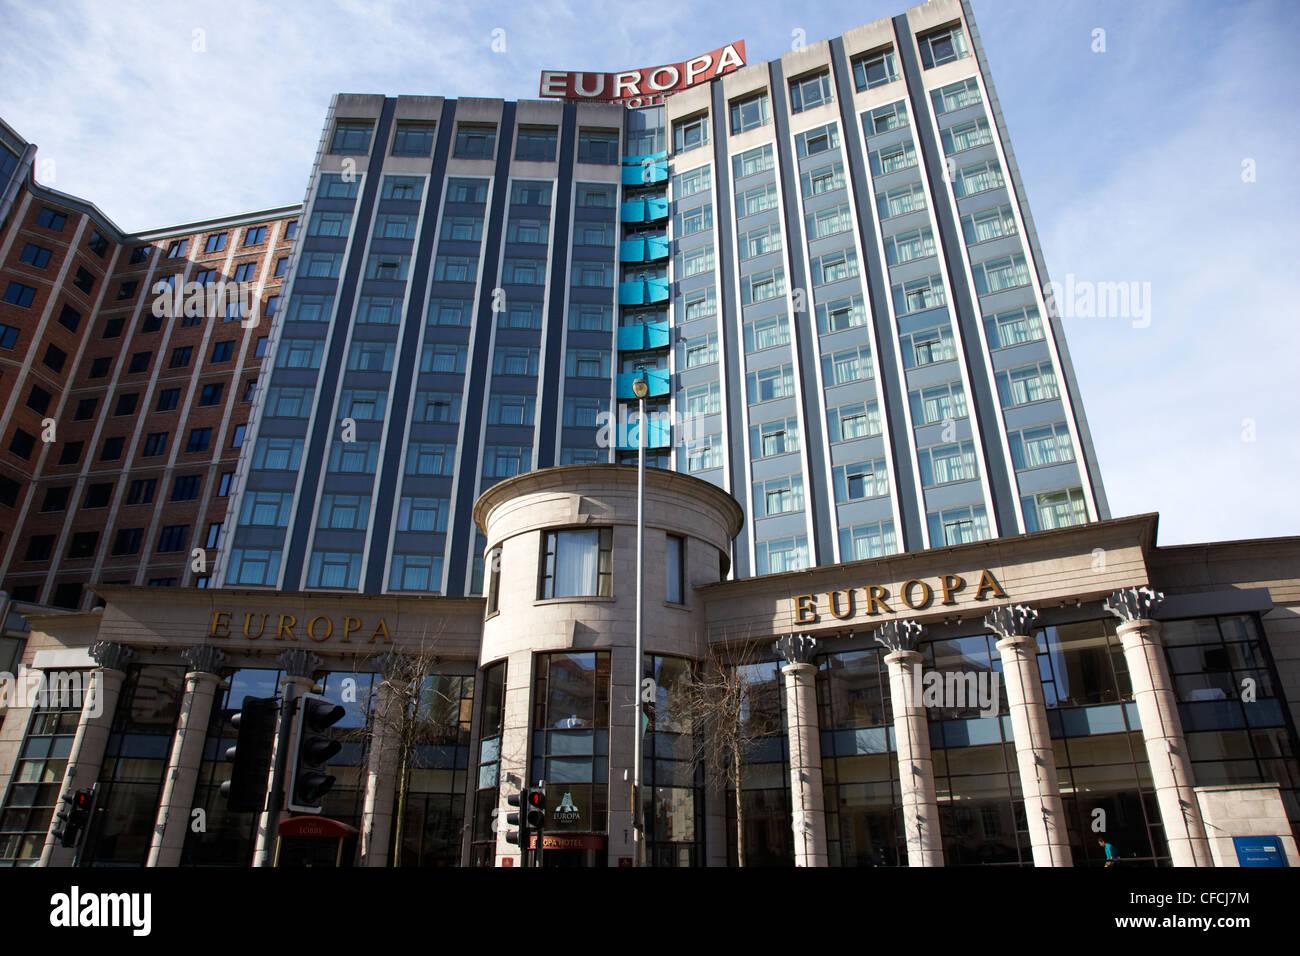 The Europa Hotel run by Hastings Belfast Northern Ireland UK - Stock Image